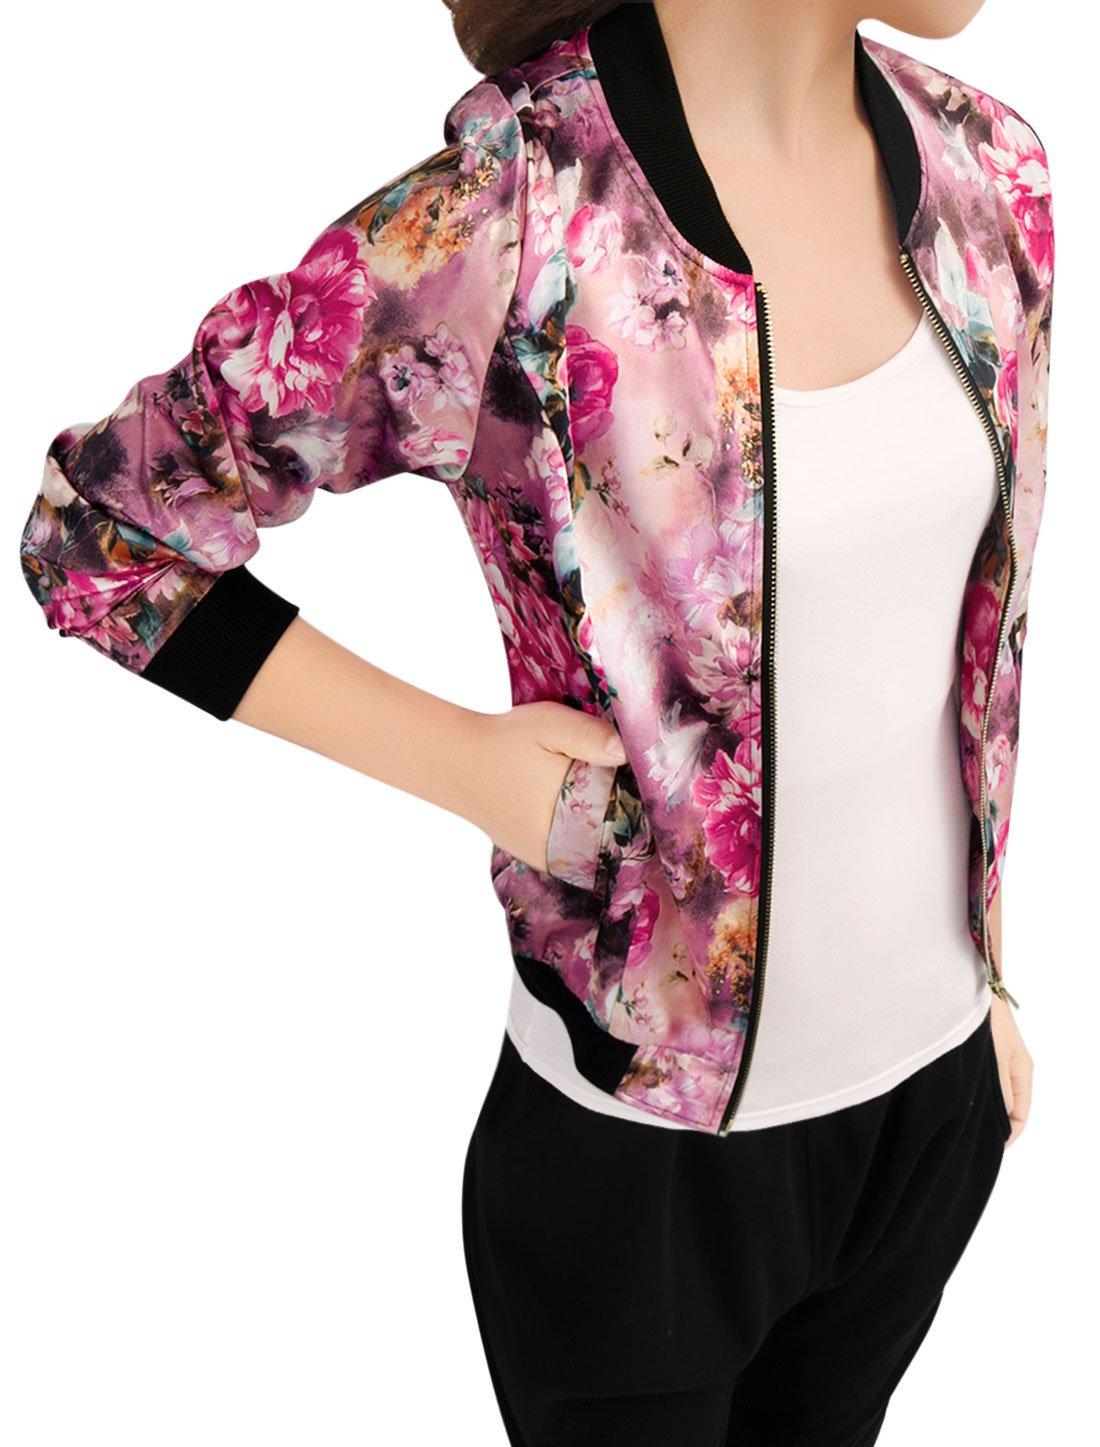 Allegra K Women's Long Sleeve Zip up Floral Print Casual Bomber Jacket Fuchsia S by Allegra K (Image #2)